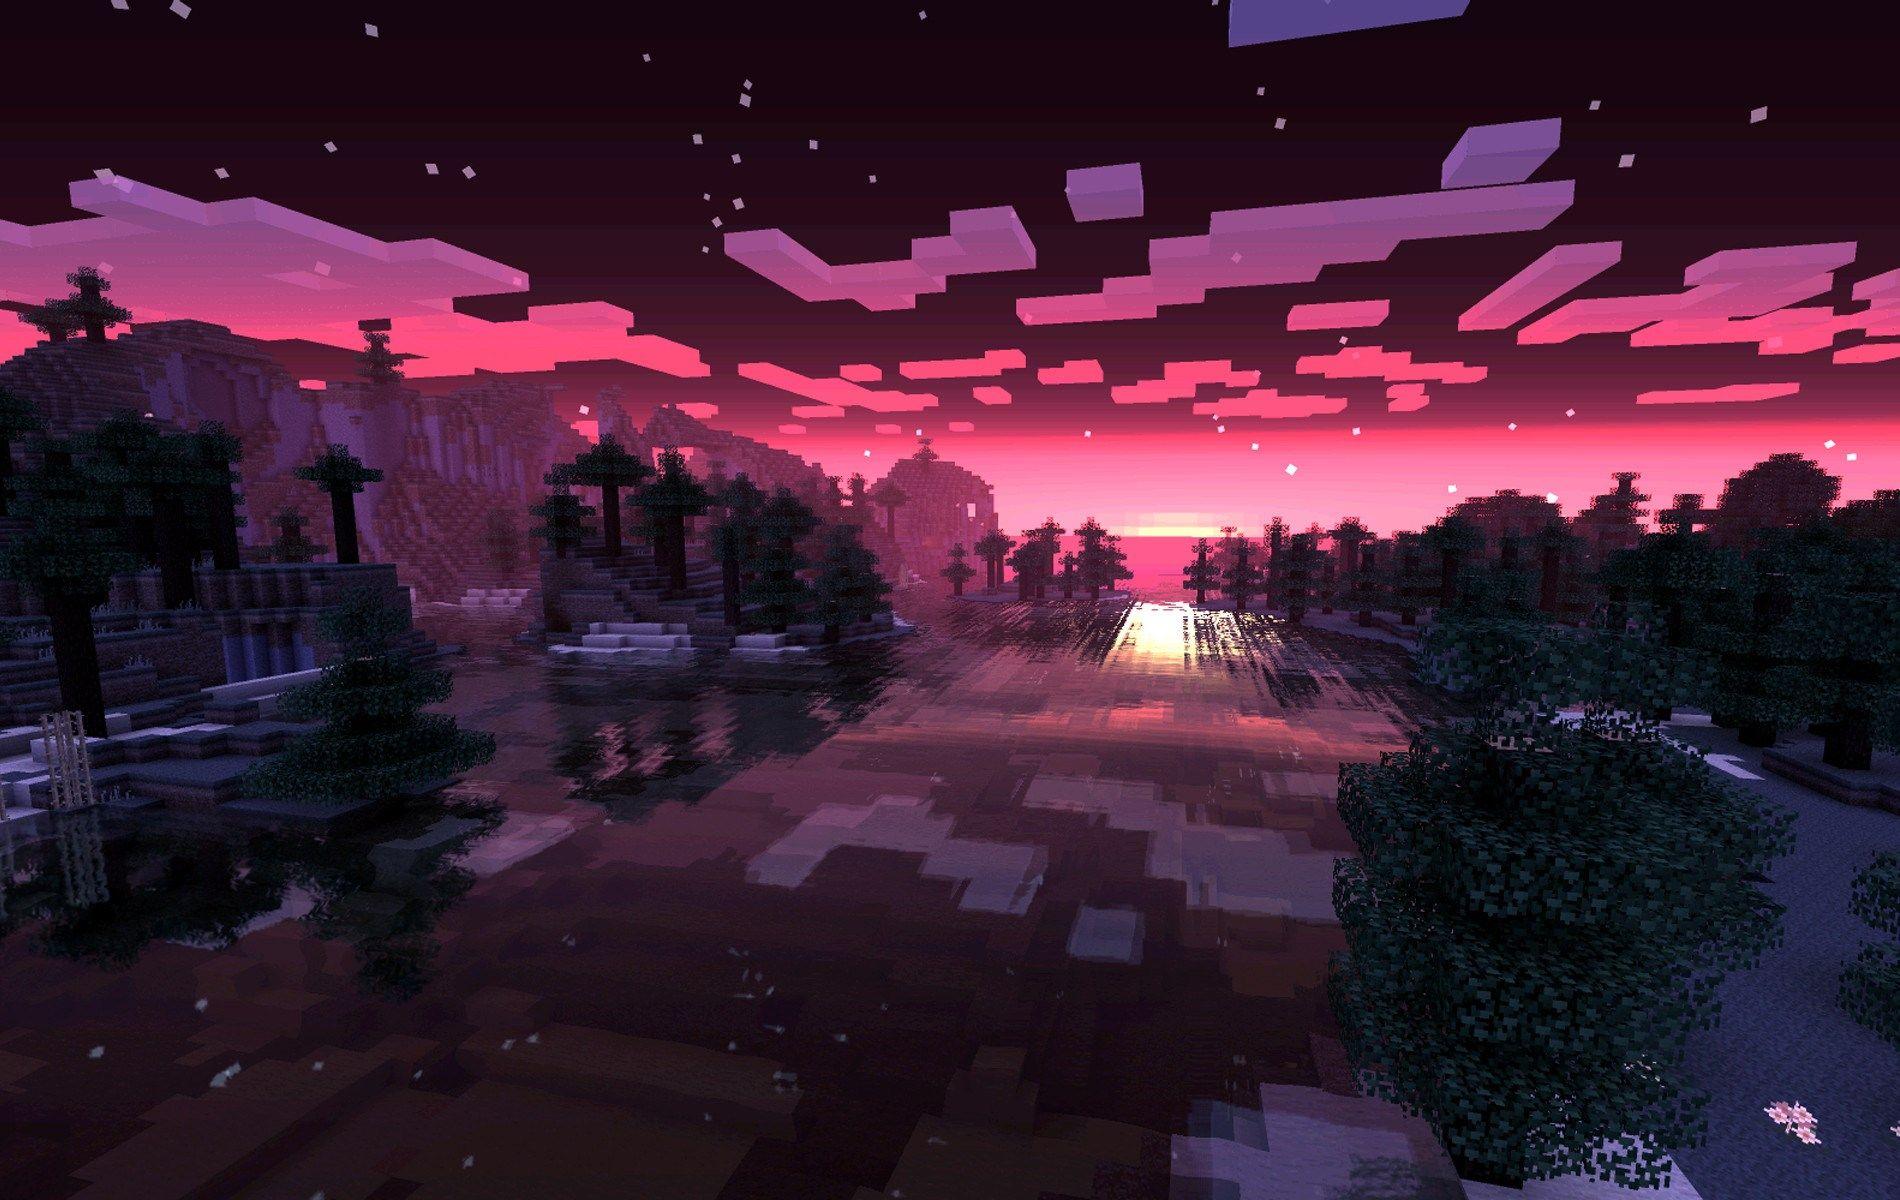 Popular Wallpaper Minecraft Night - bac89031bcbc795834a1ce449f18b163  Gallery_833538.jpg